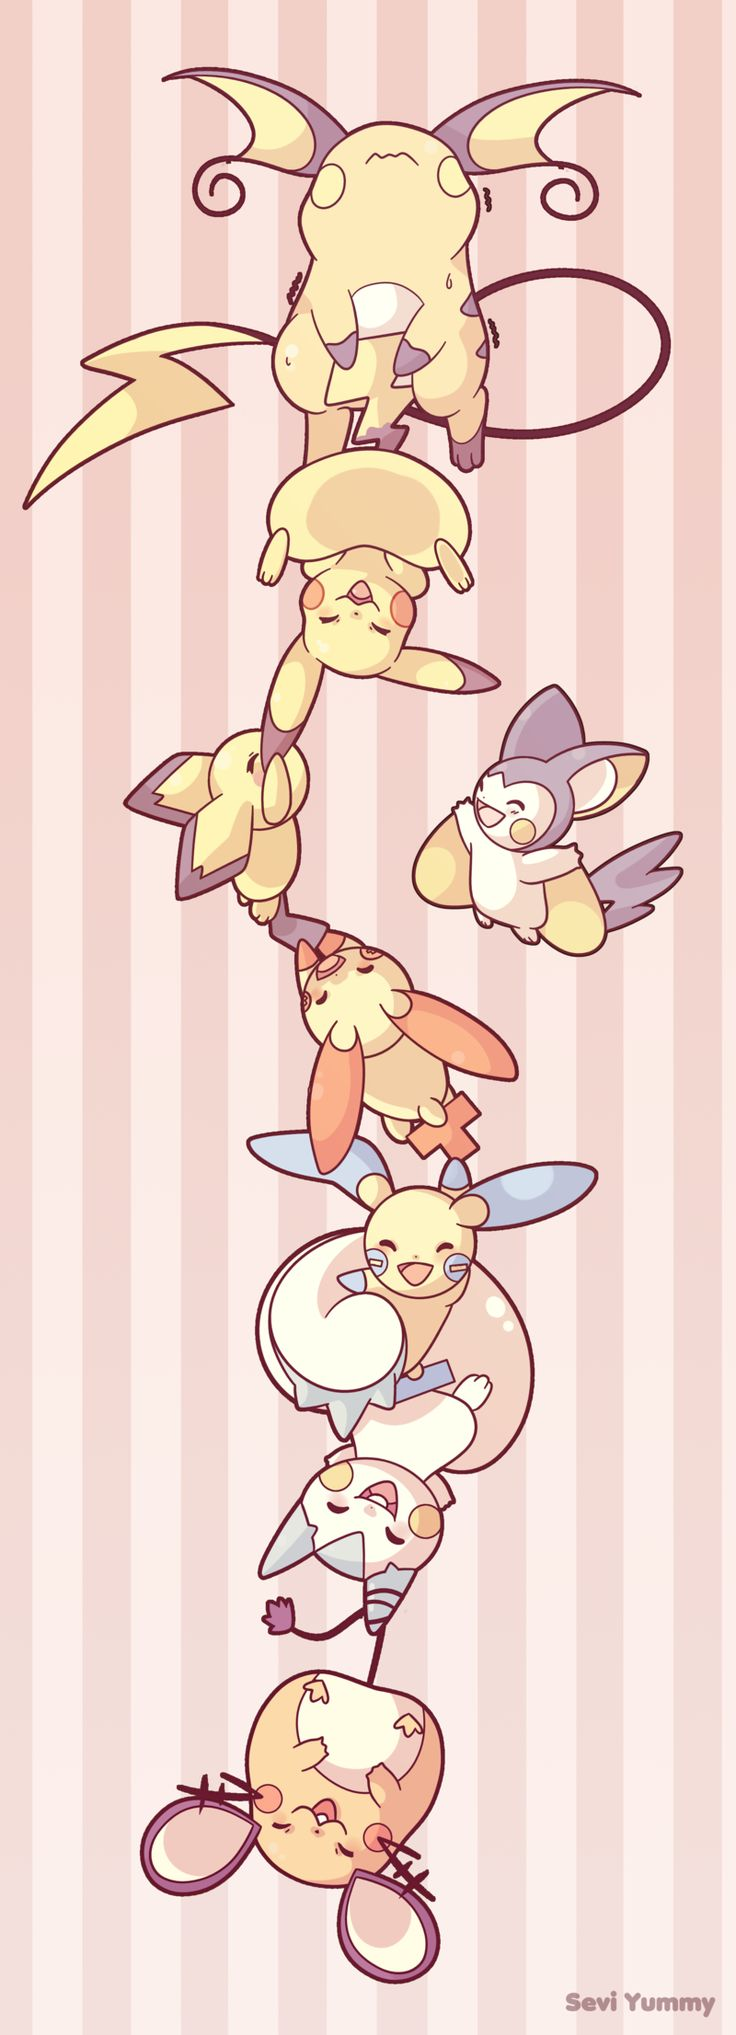 Pikachu Family by SeviYummy.deviantart.com on @DeviantArt